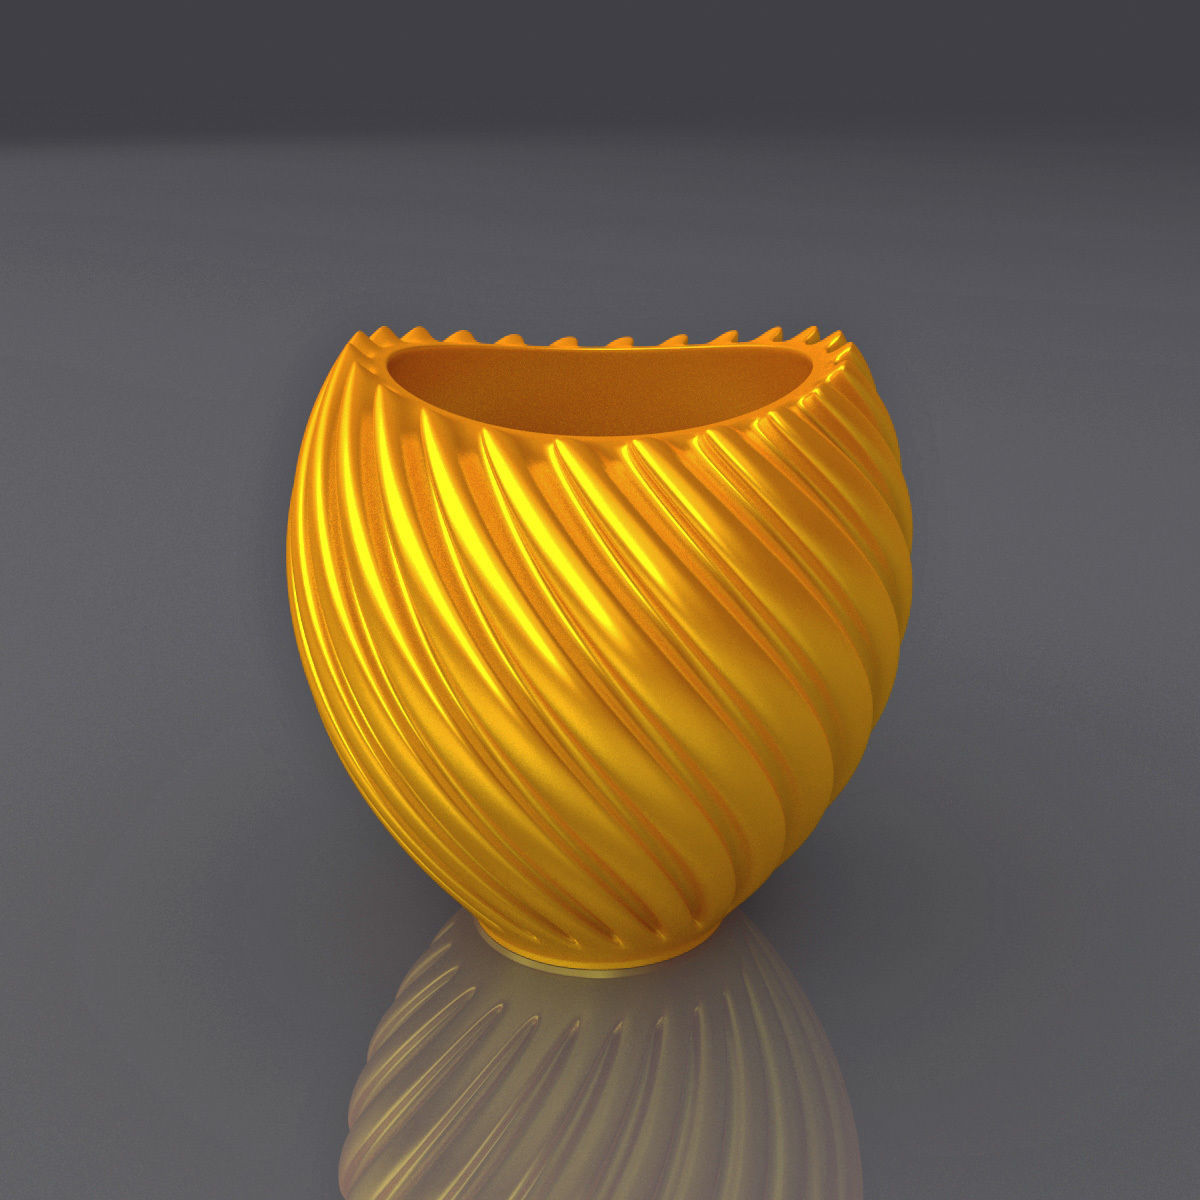 Vase Shape Design 3D Print Model